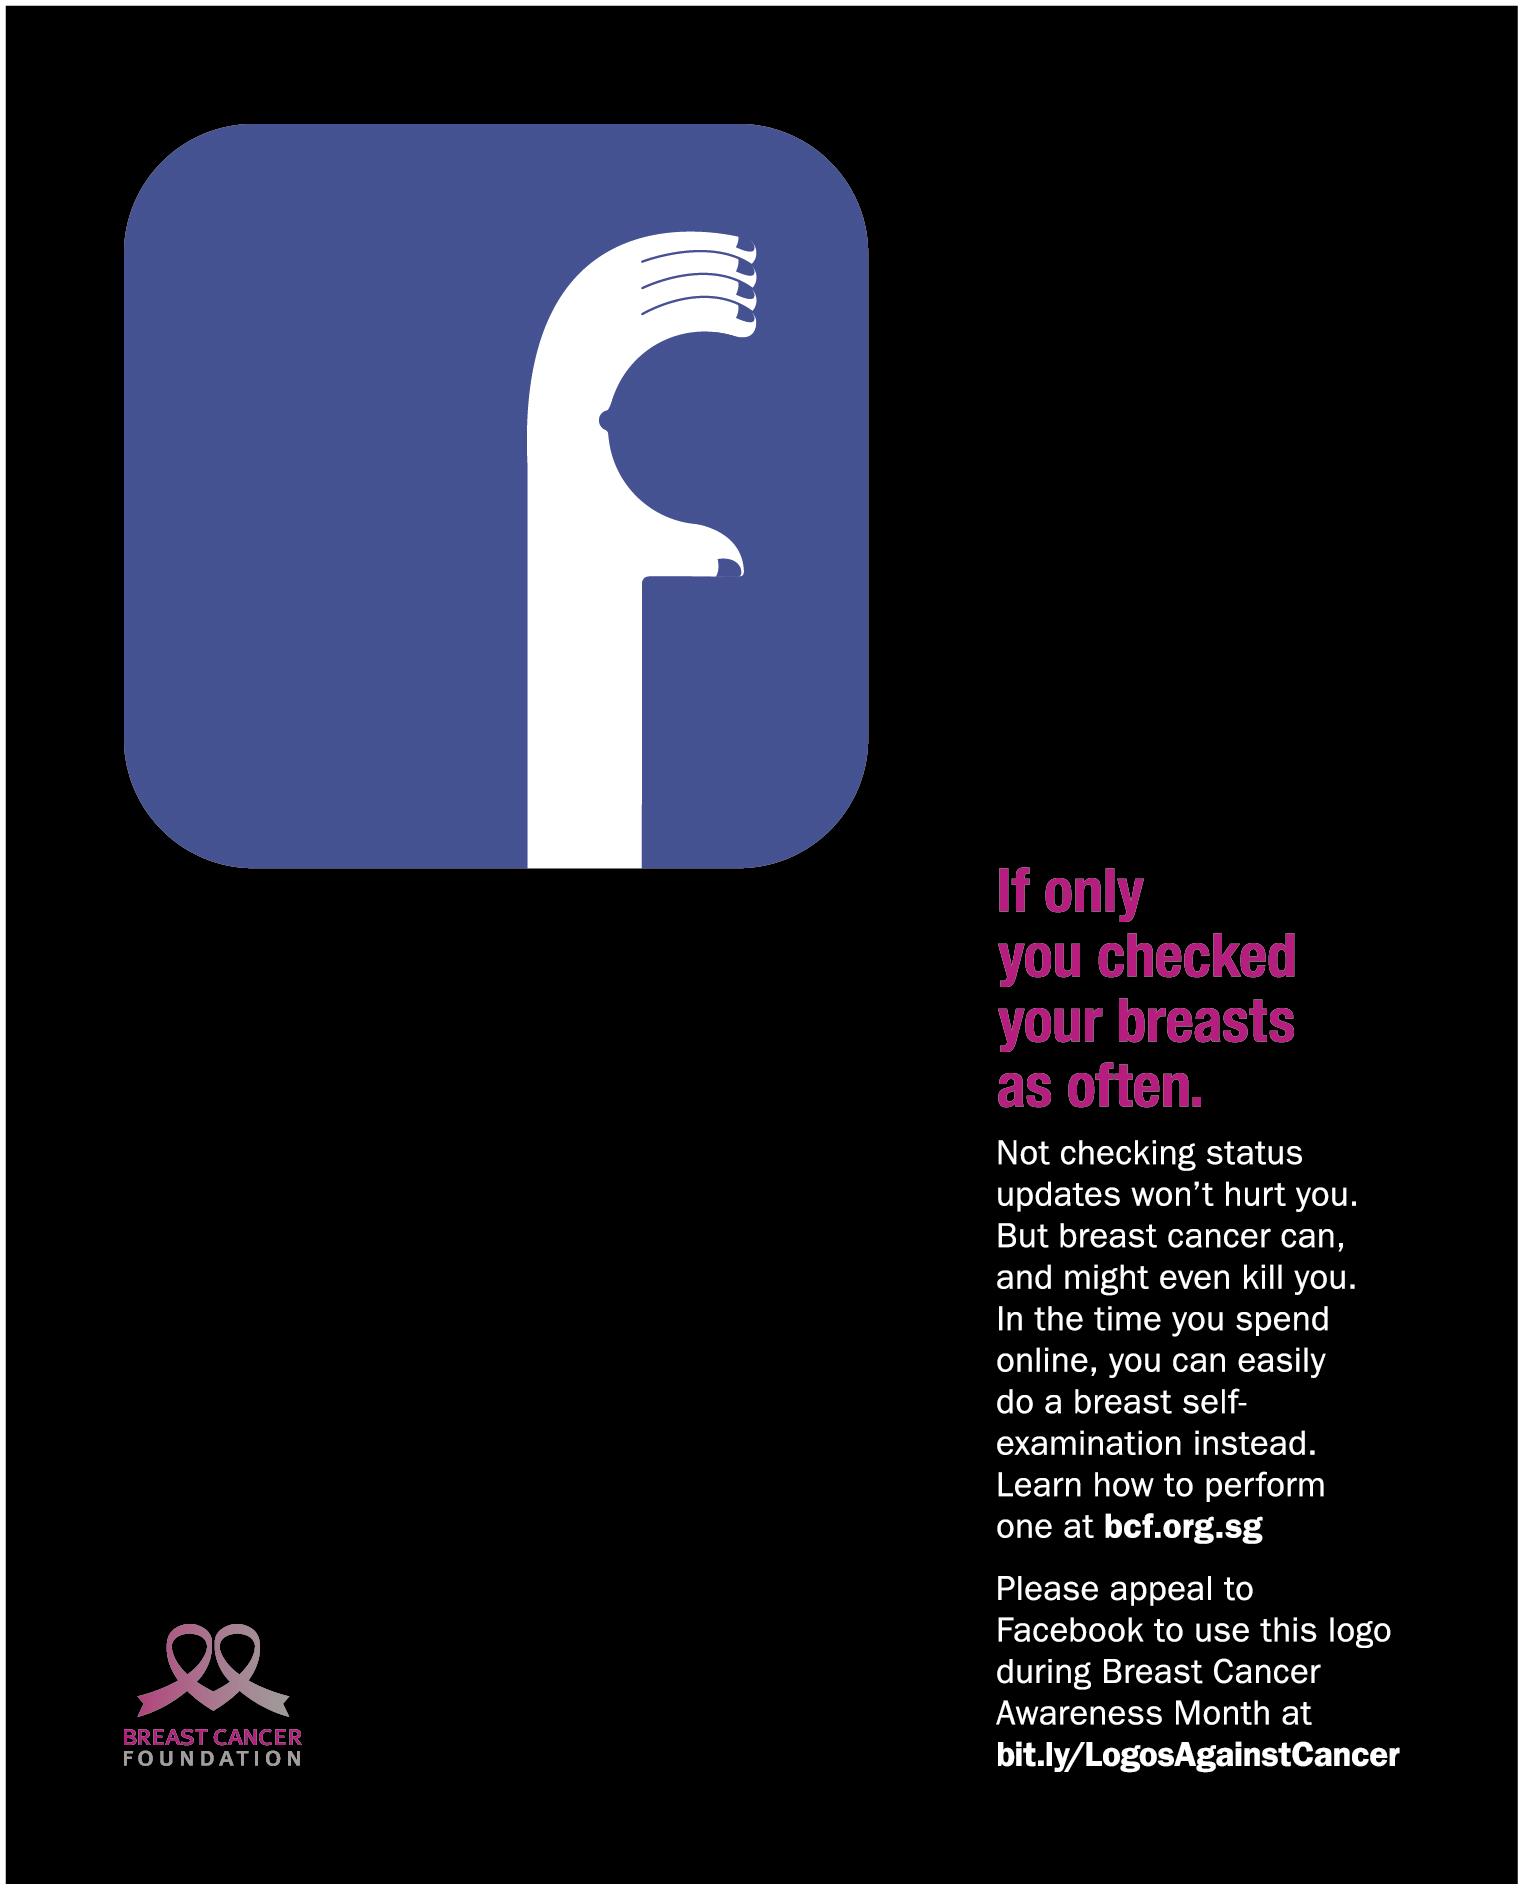 recipe: breast cancer awareness facebook game 2017 [10]